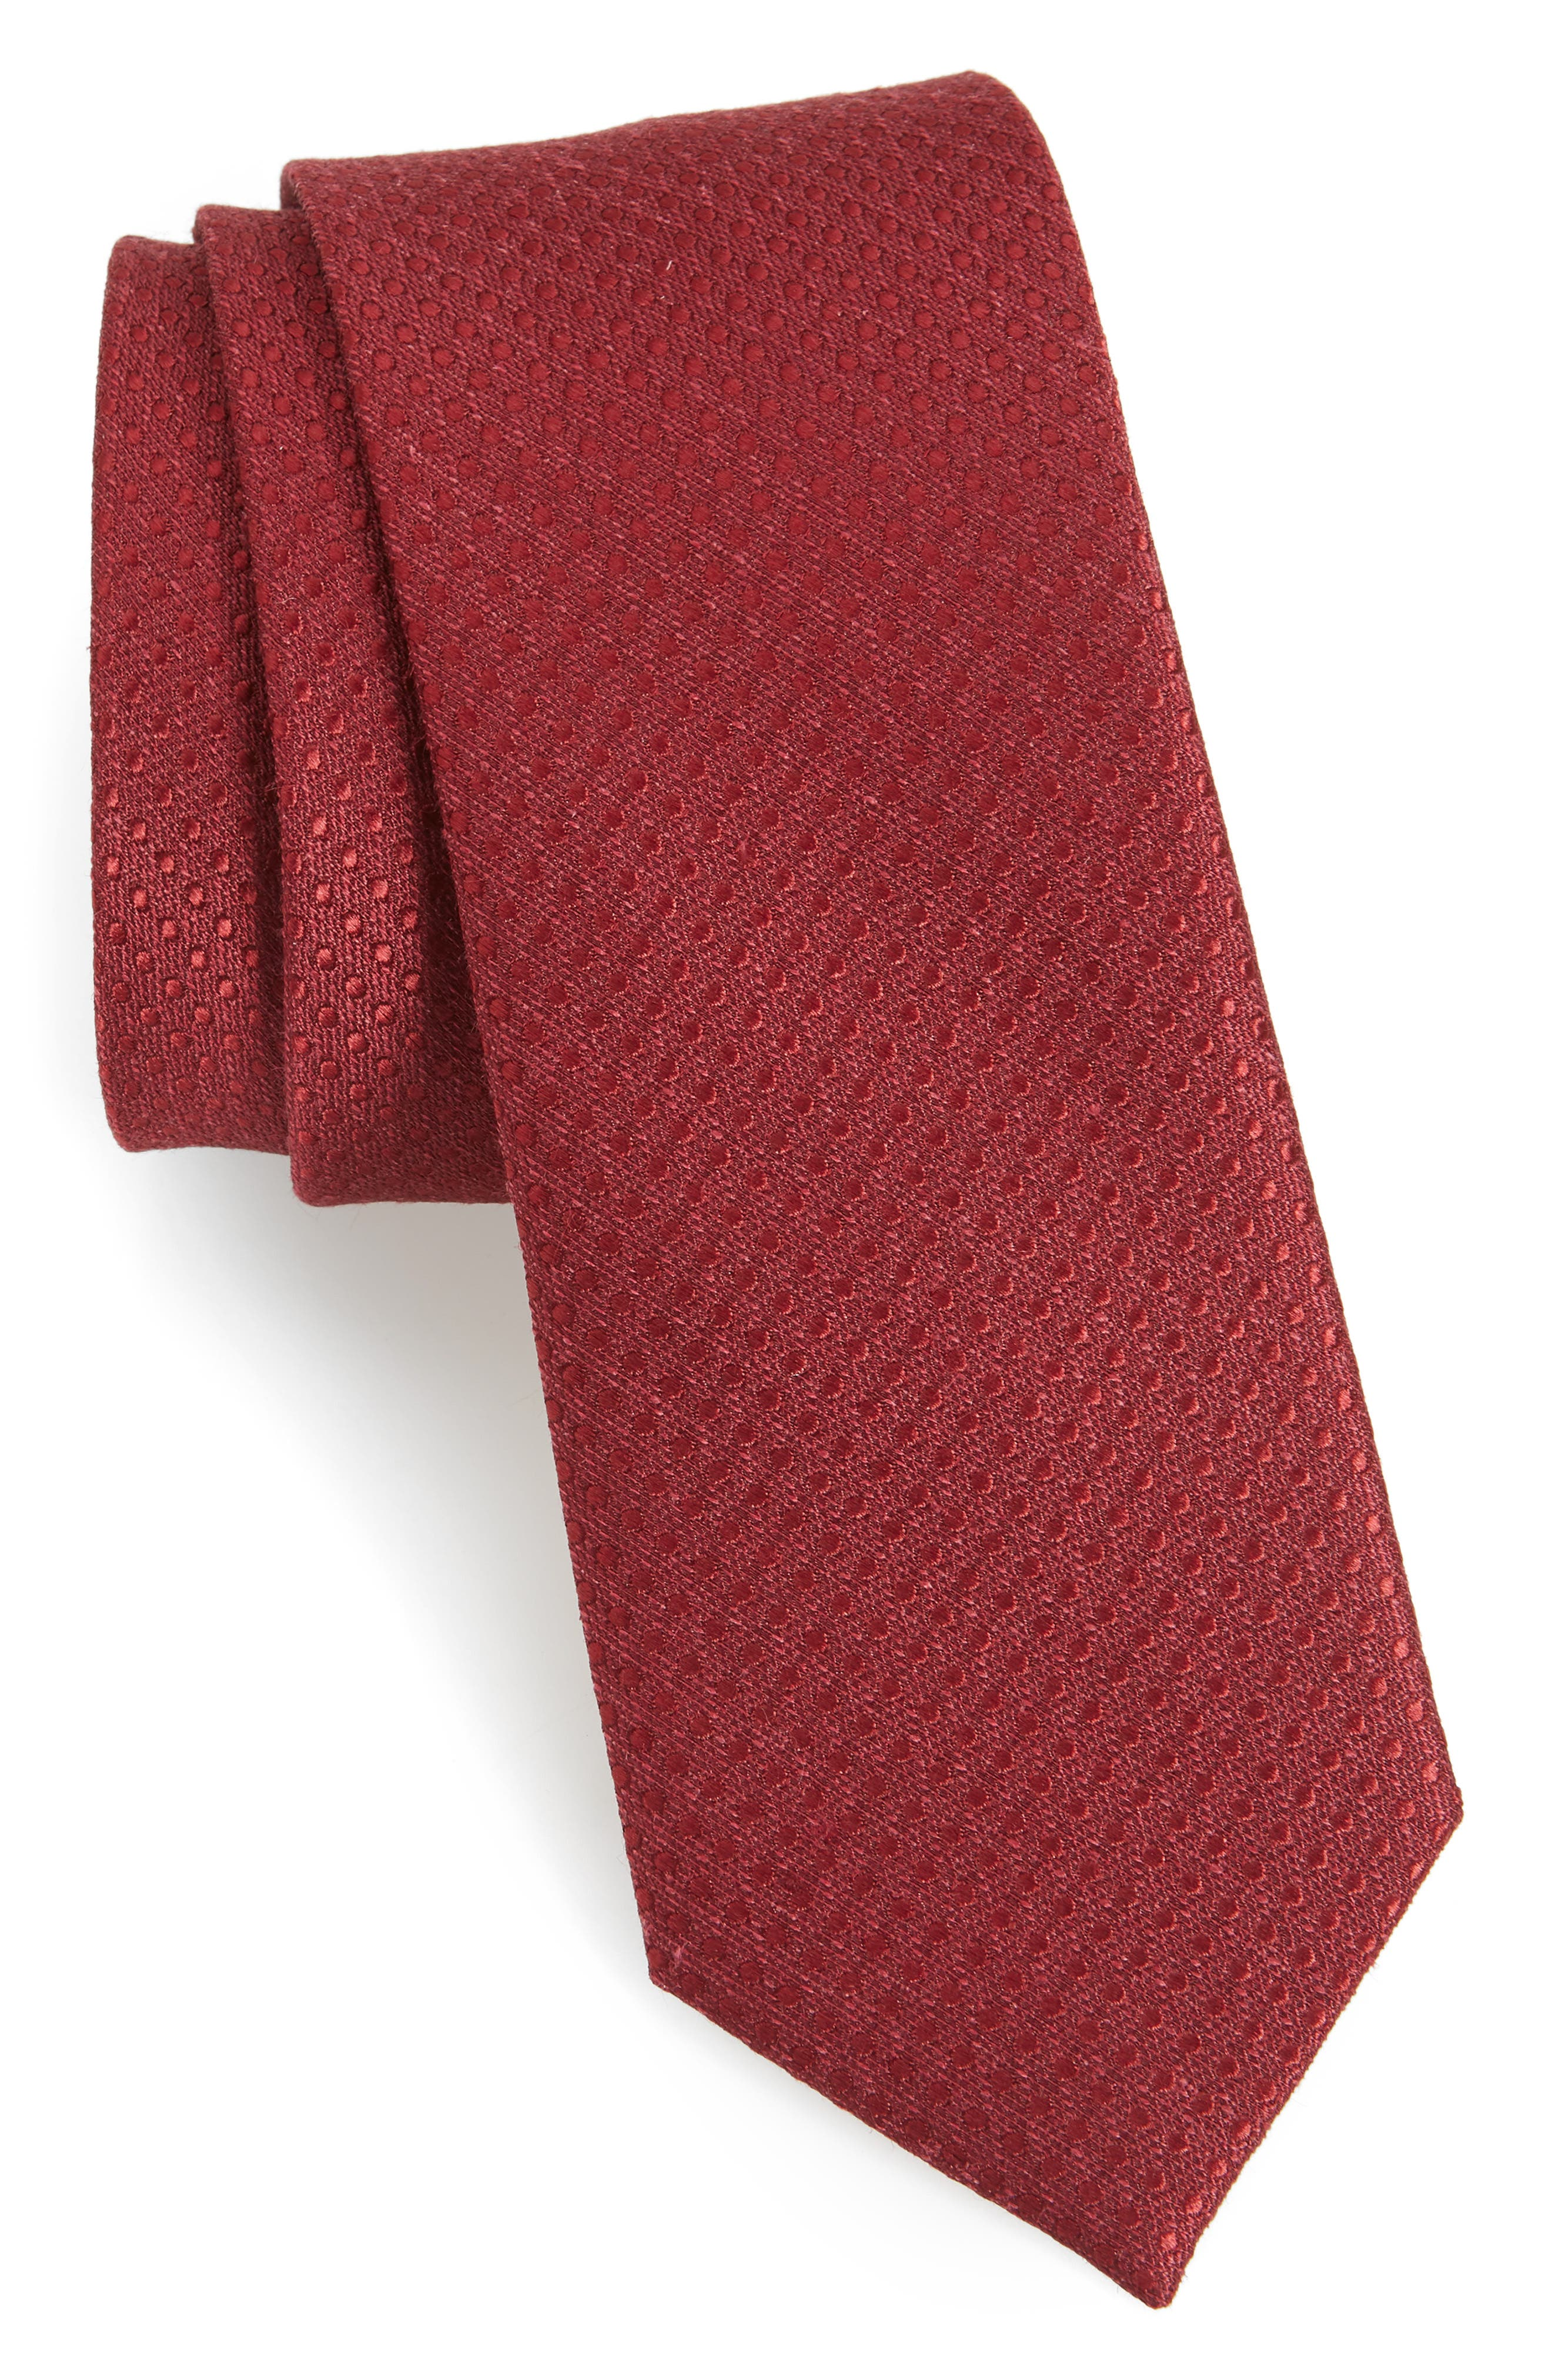 Main Image - The Tie Bar Spin Dot Silk & Cotton Tie